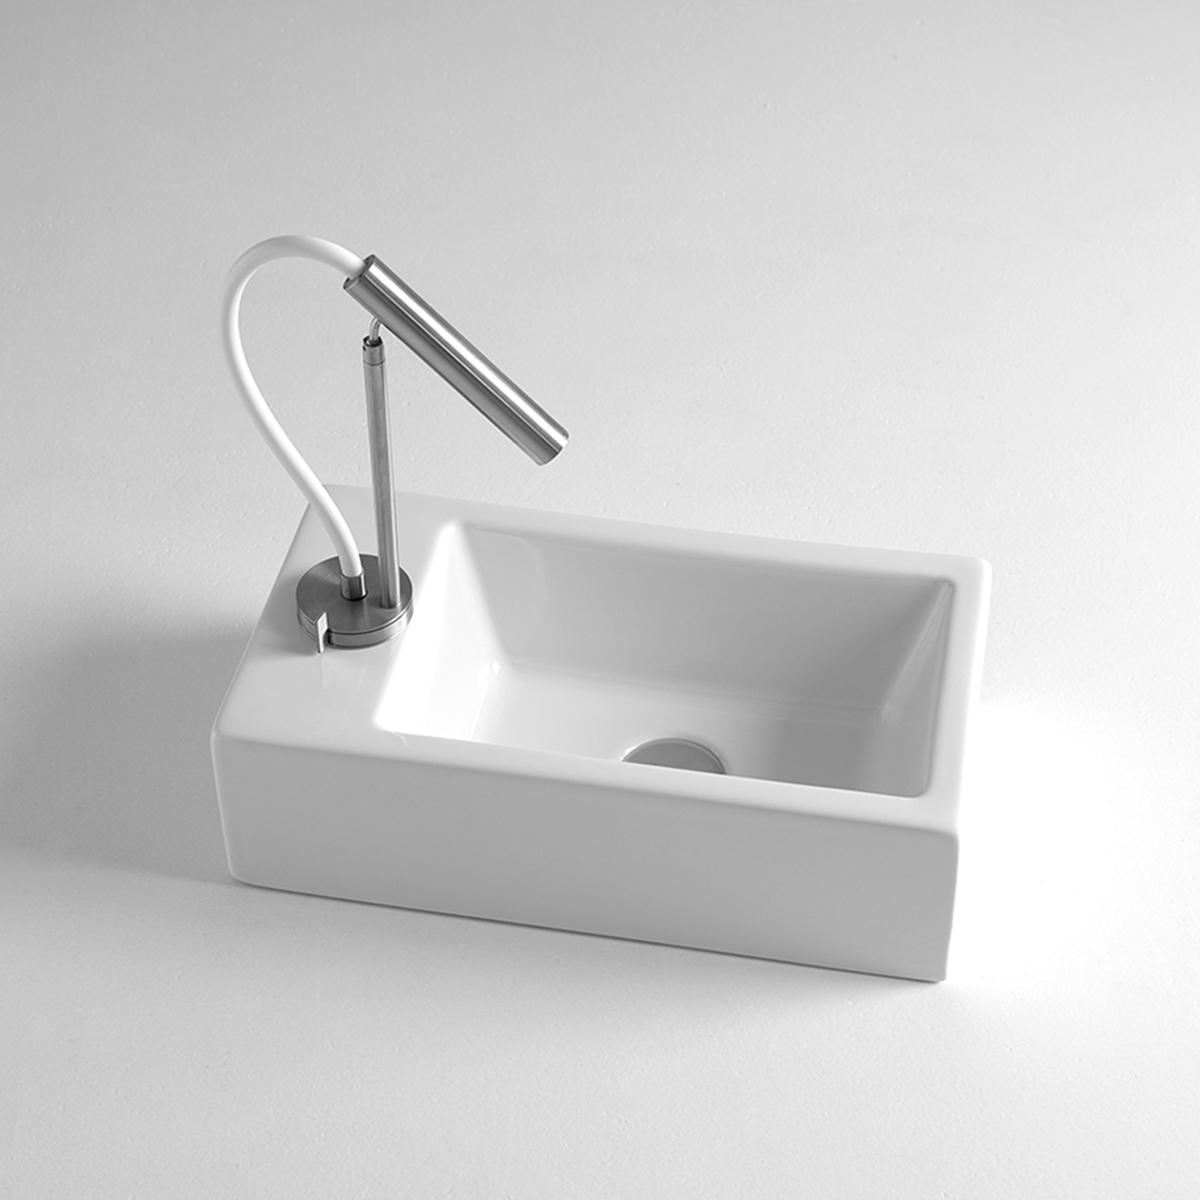 Mini lavabo bagno 24x44 cm - Misure lavabo bagno ...